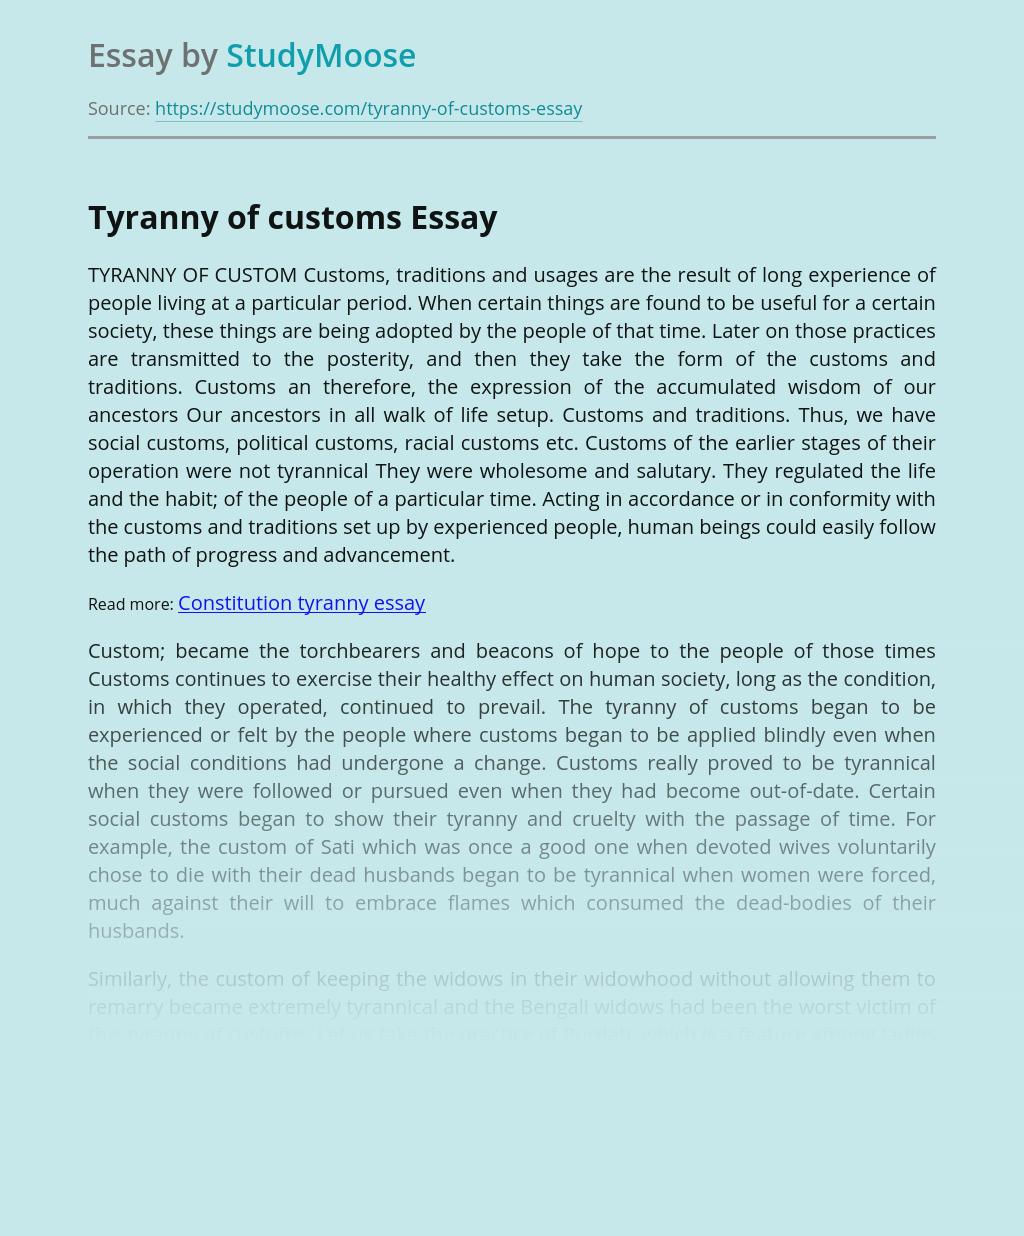 Tyranny of customs